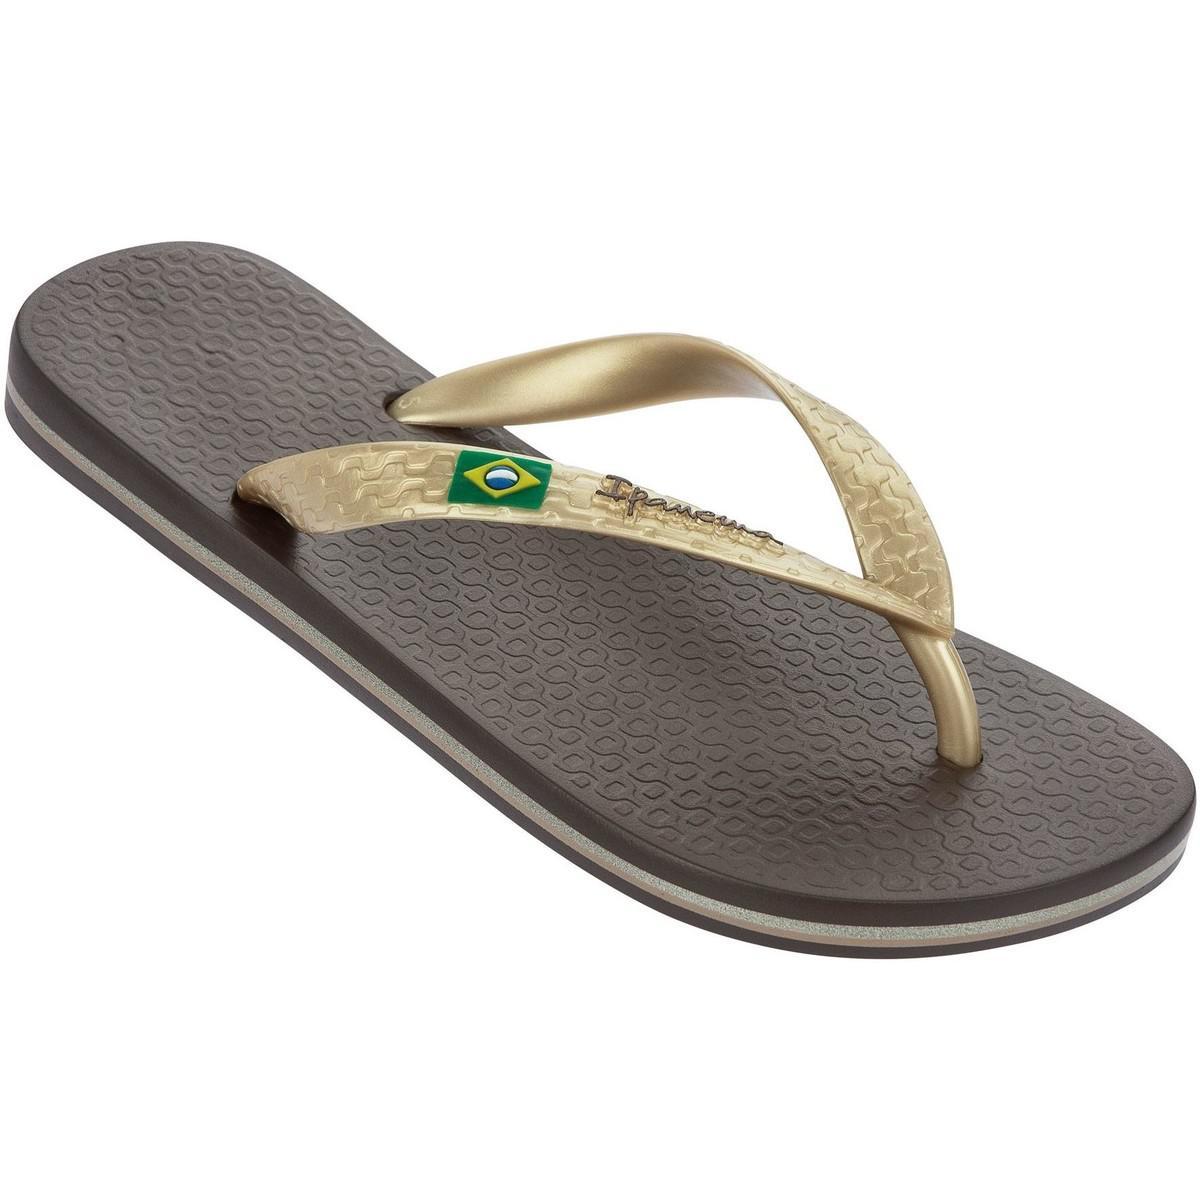 646fe391e Ipanema. Brazil Ii Flag Sandals In Brown Gold 80408a Women s Flip Flops ...